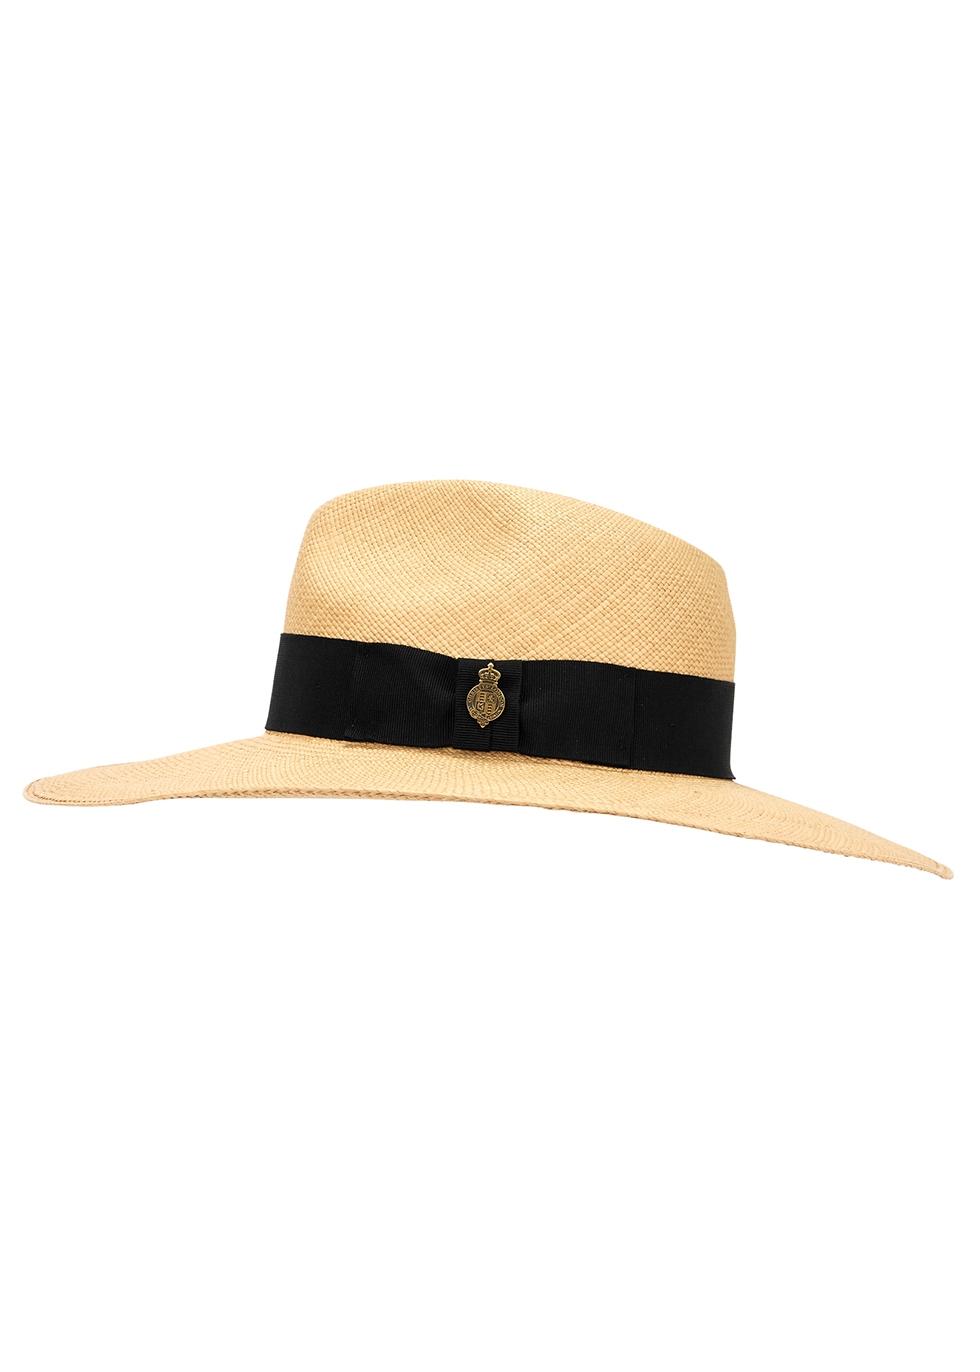 Jessica straw wide-brim panama hat